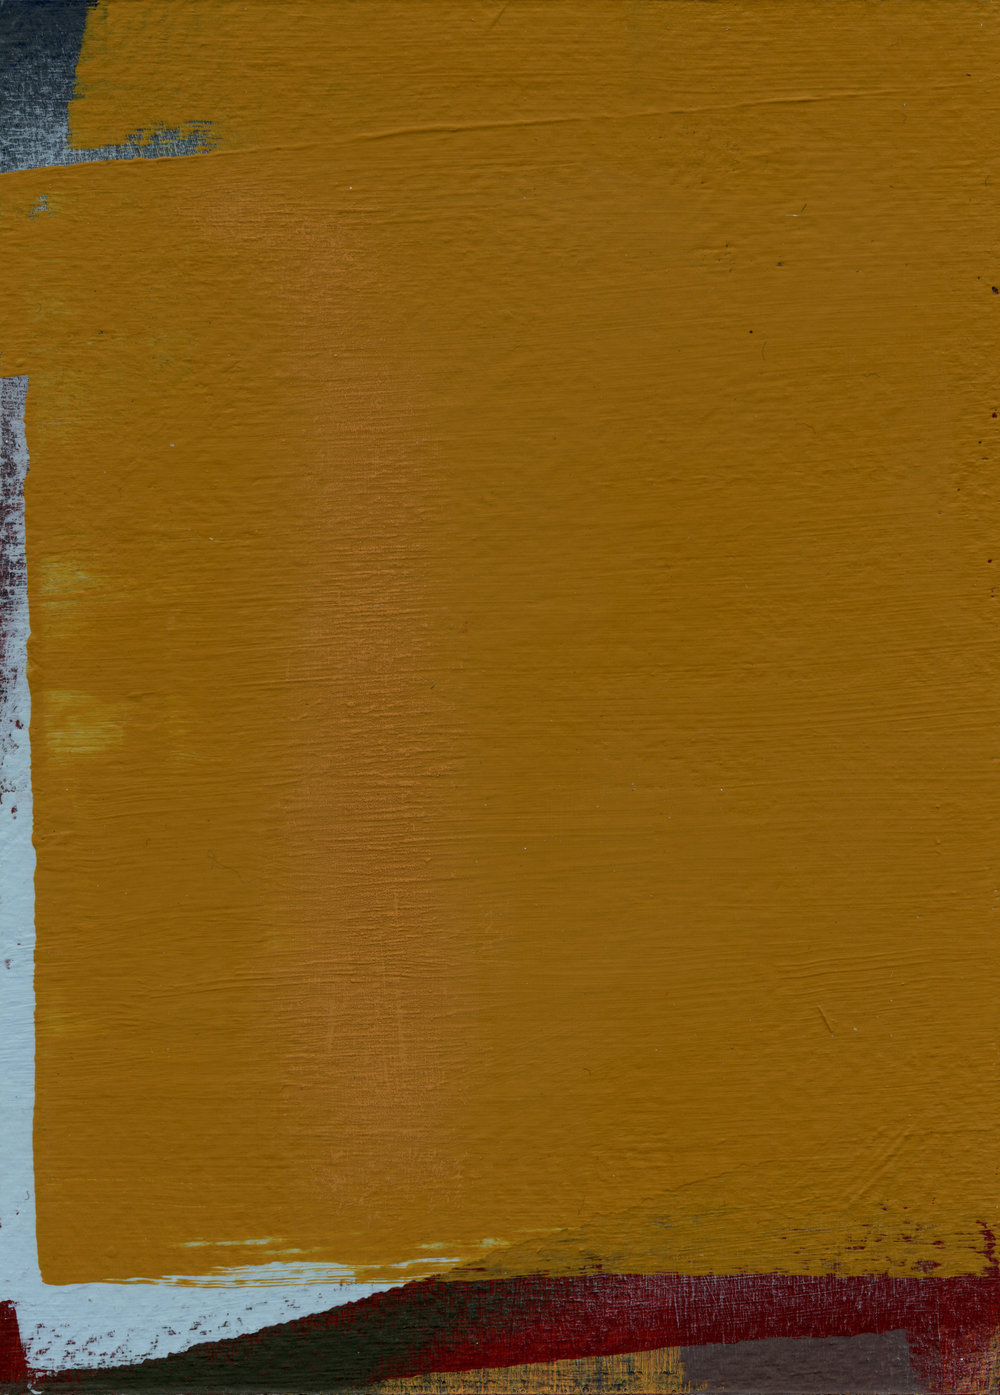 img008(building-a-wall.jpg